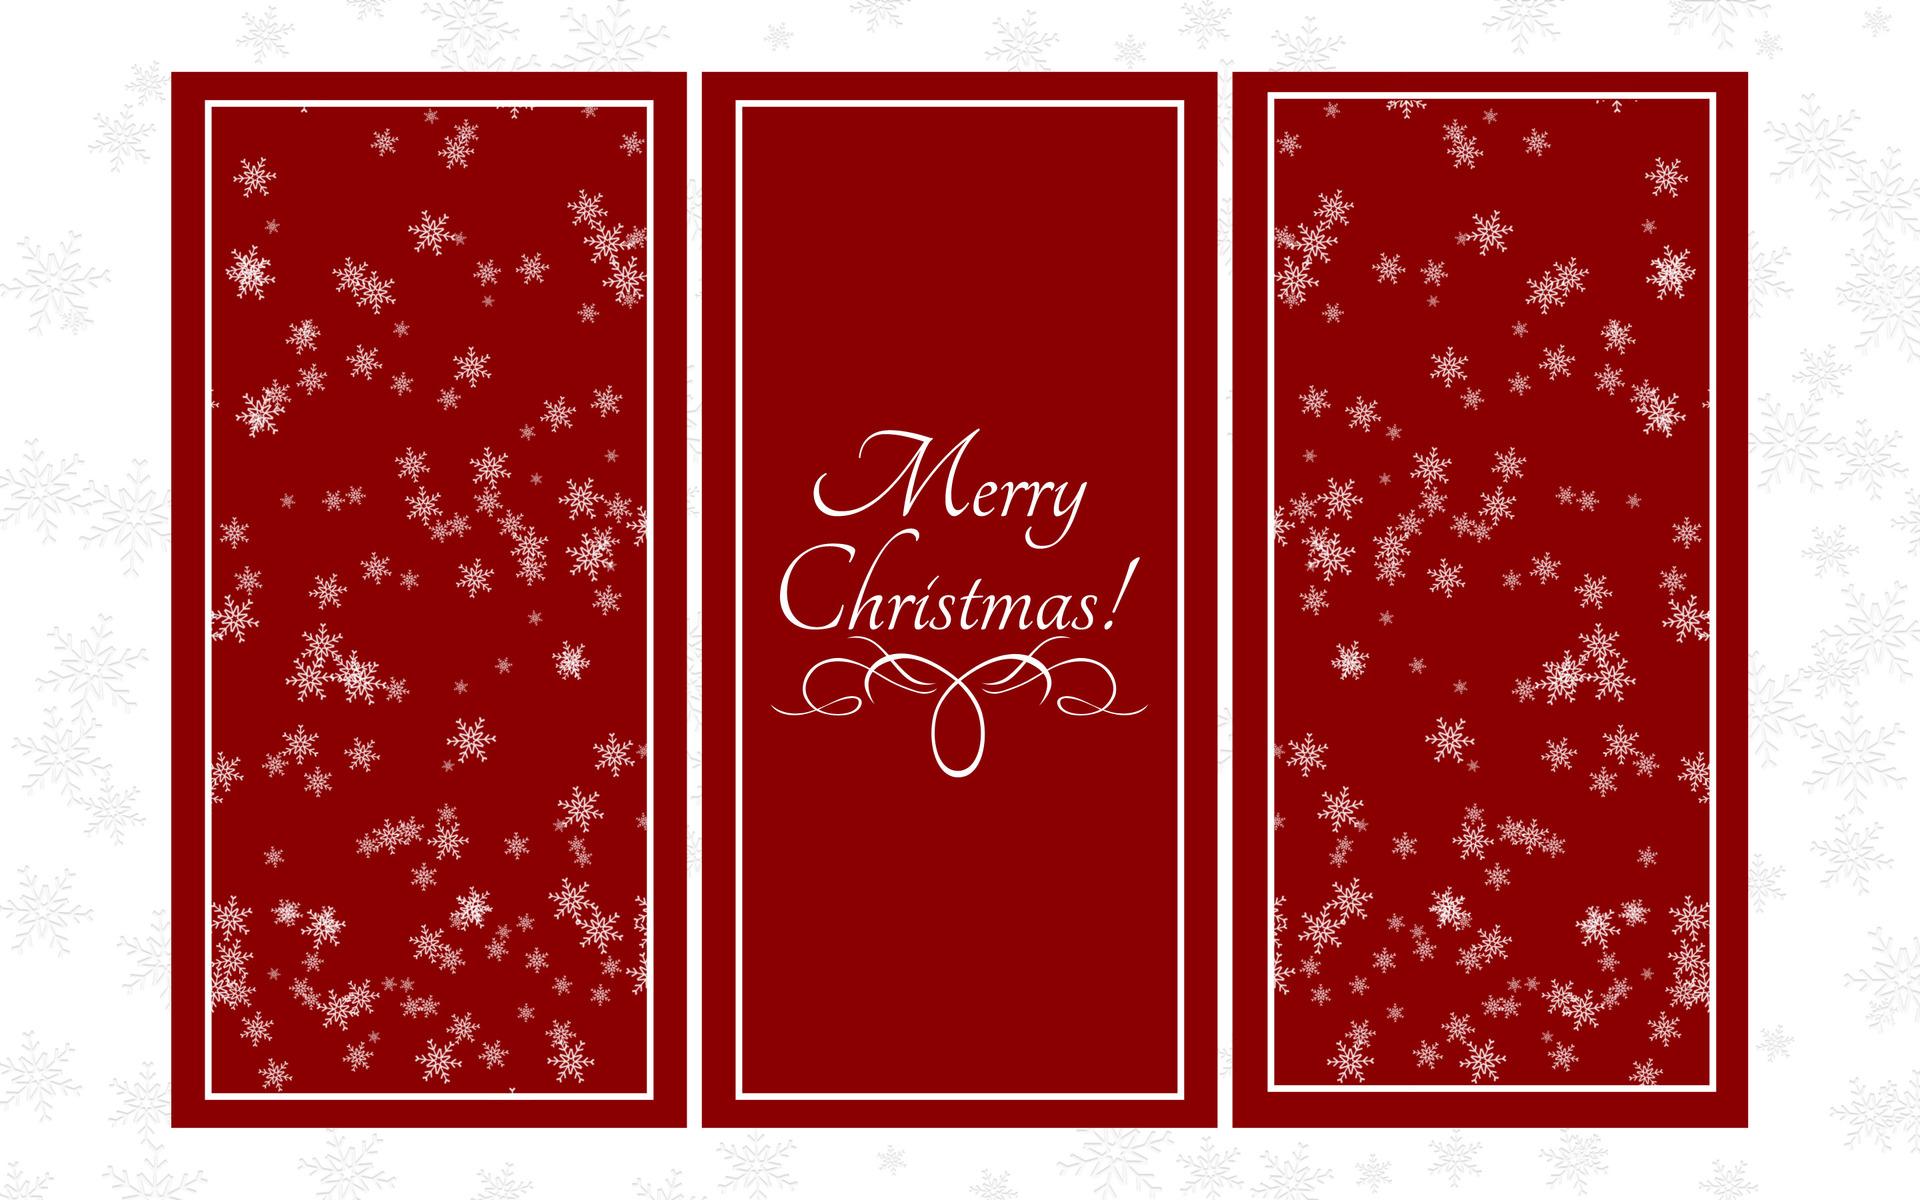 Merry Christmas Wallpaper Desktop